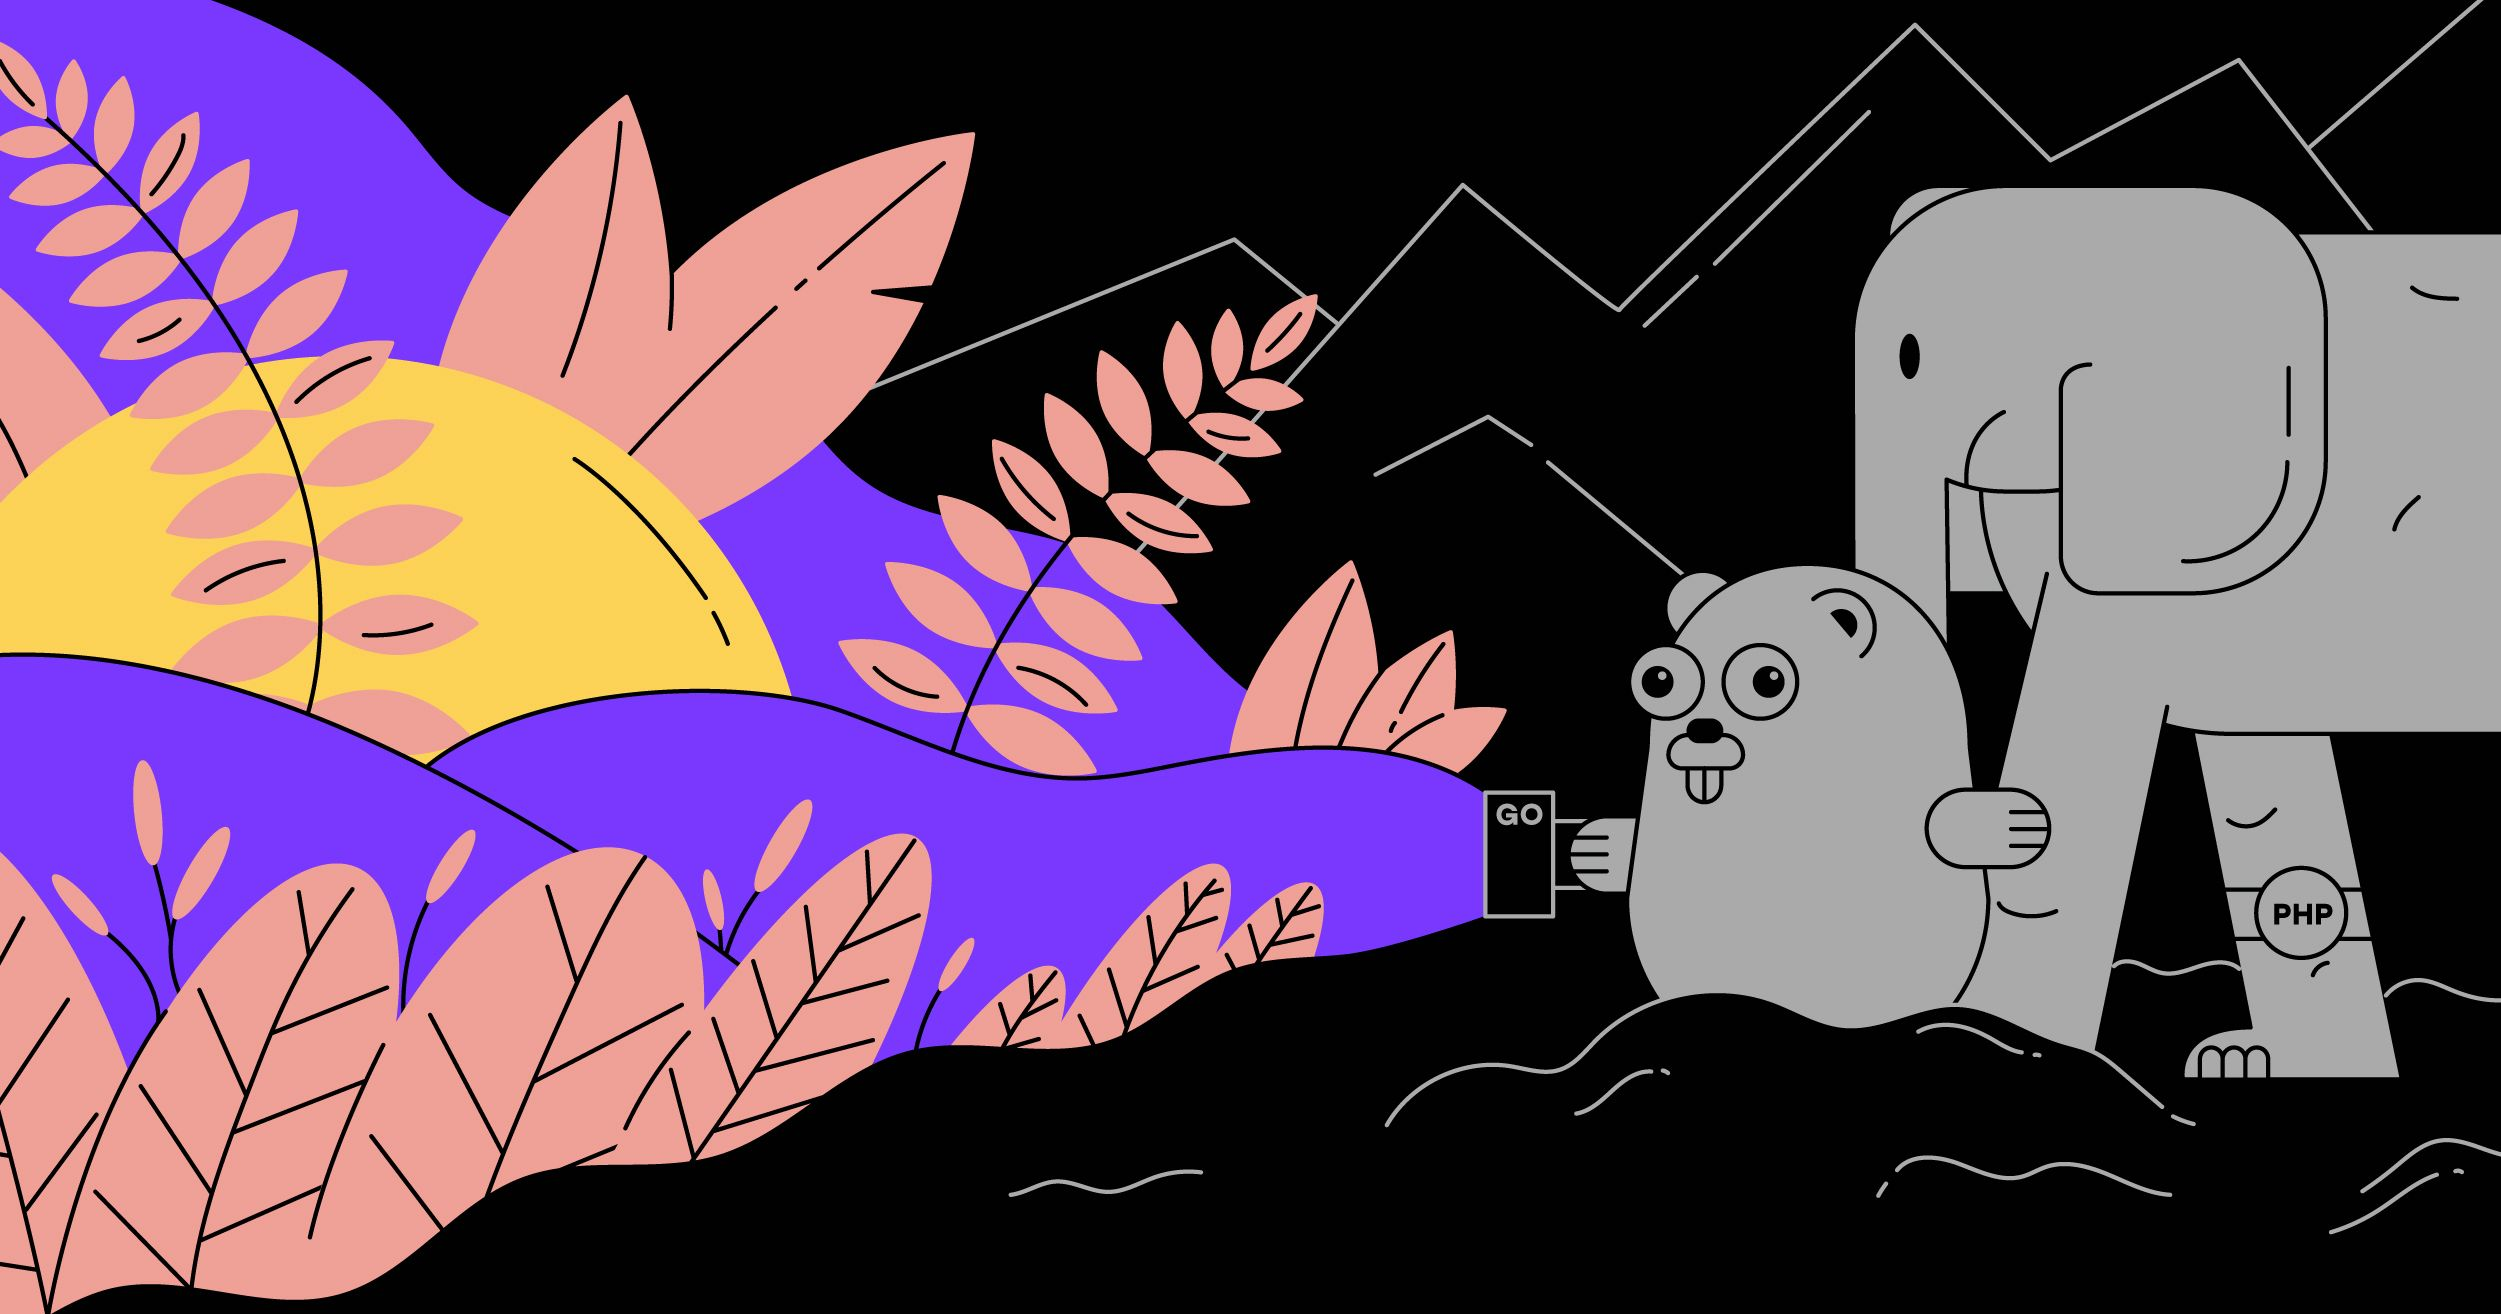 badoo_tech blog illustrations on Behance